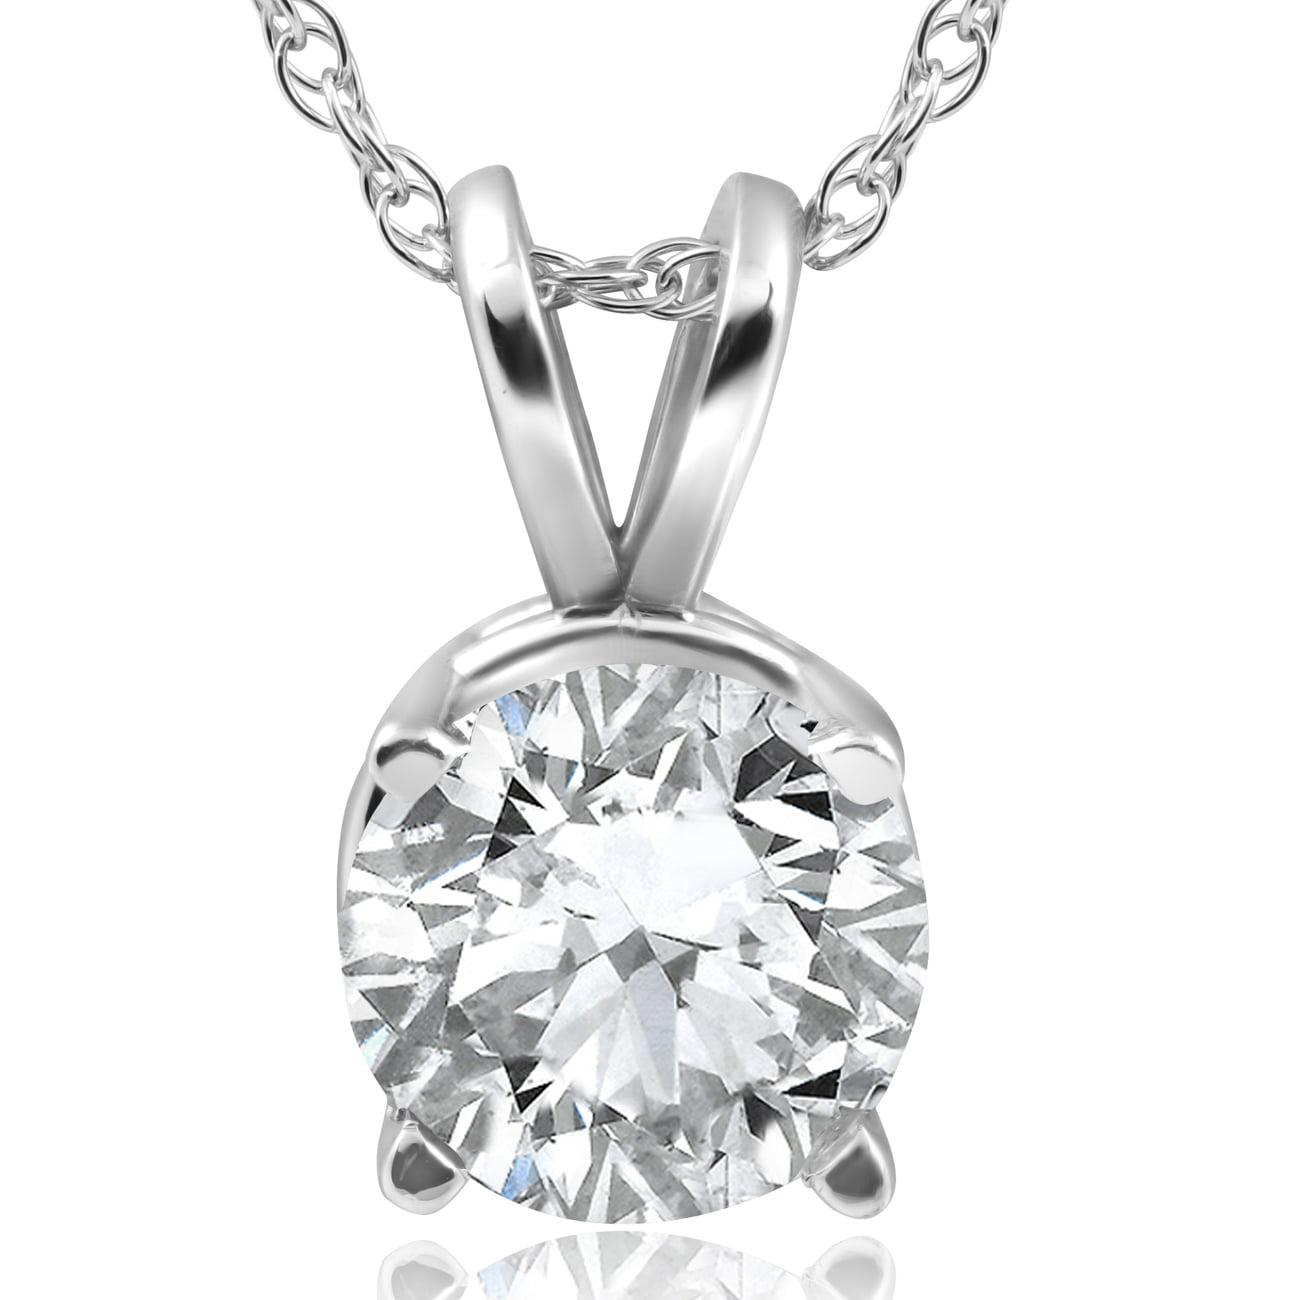 2CT Diamond Round Brilliant Solitaire Pendant & Chain 14k White Gold Enhanced